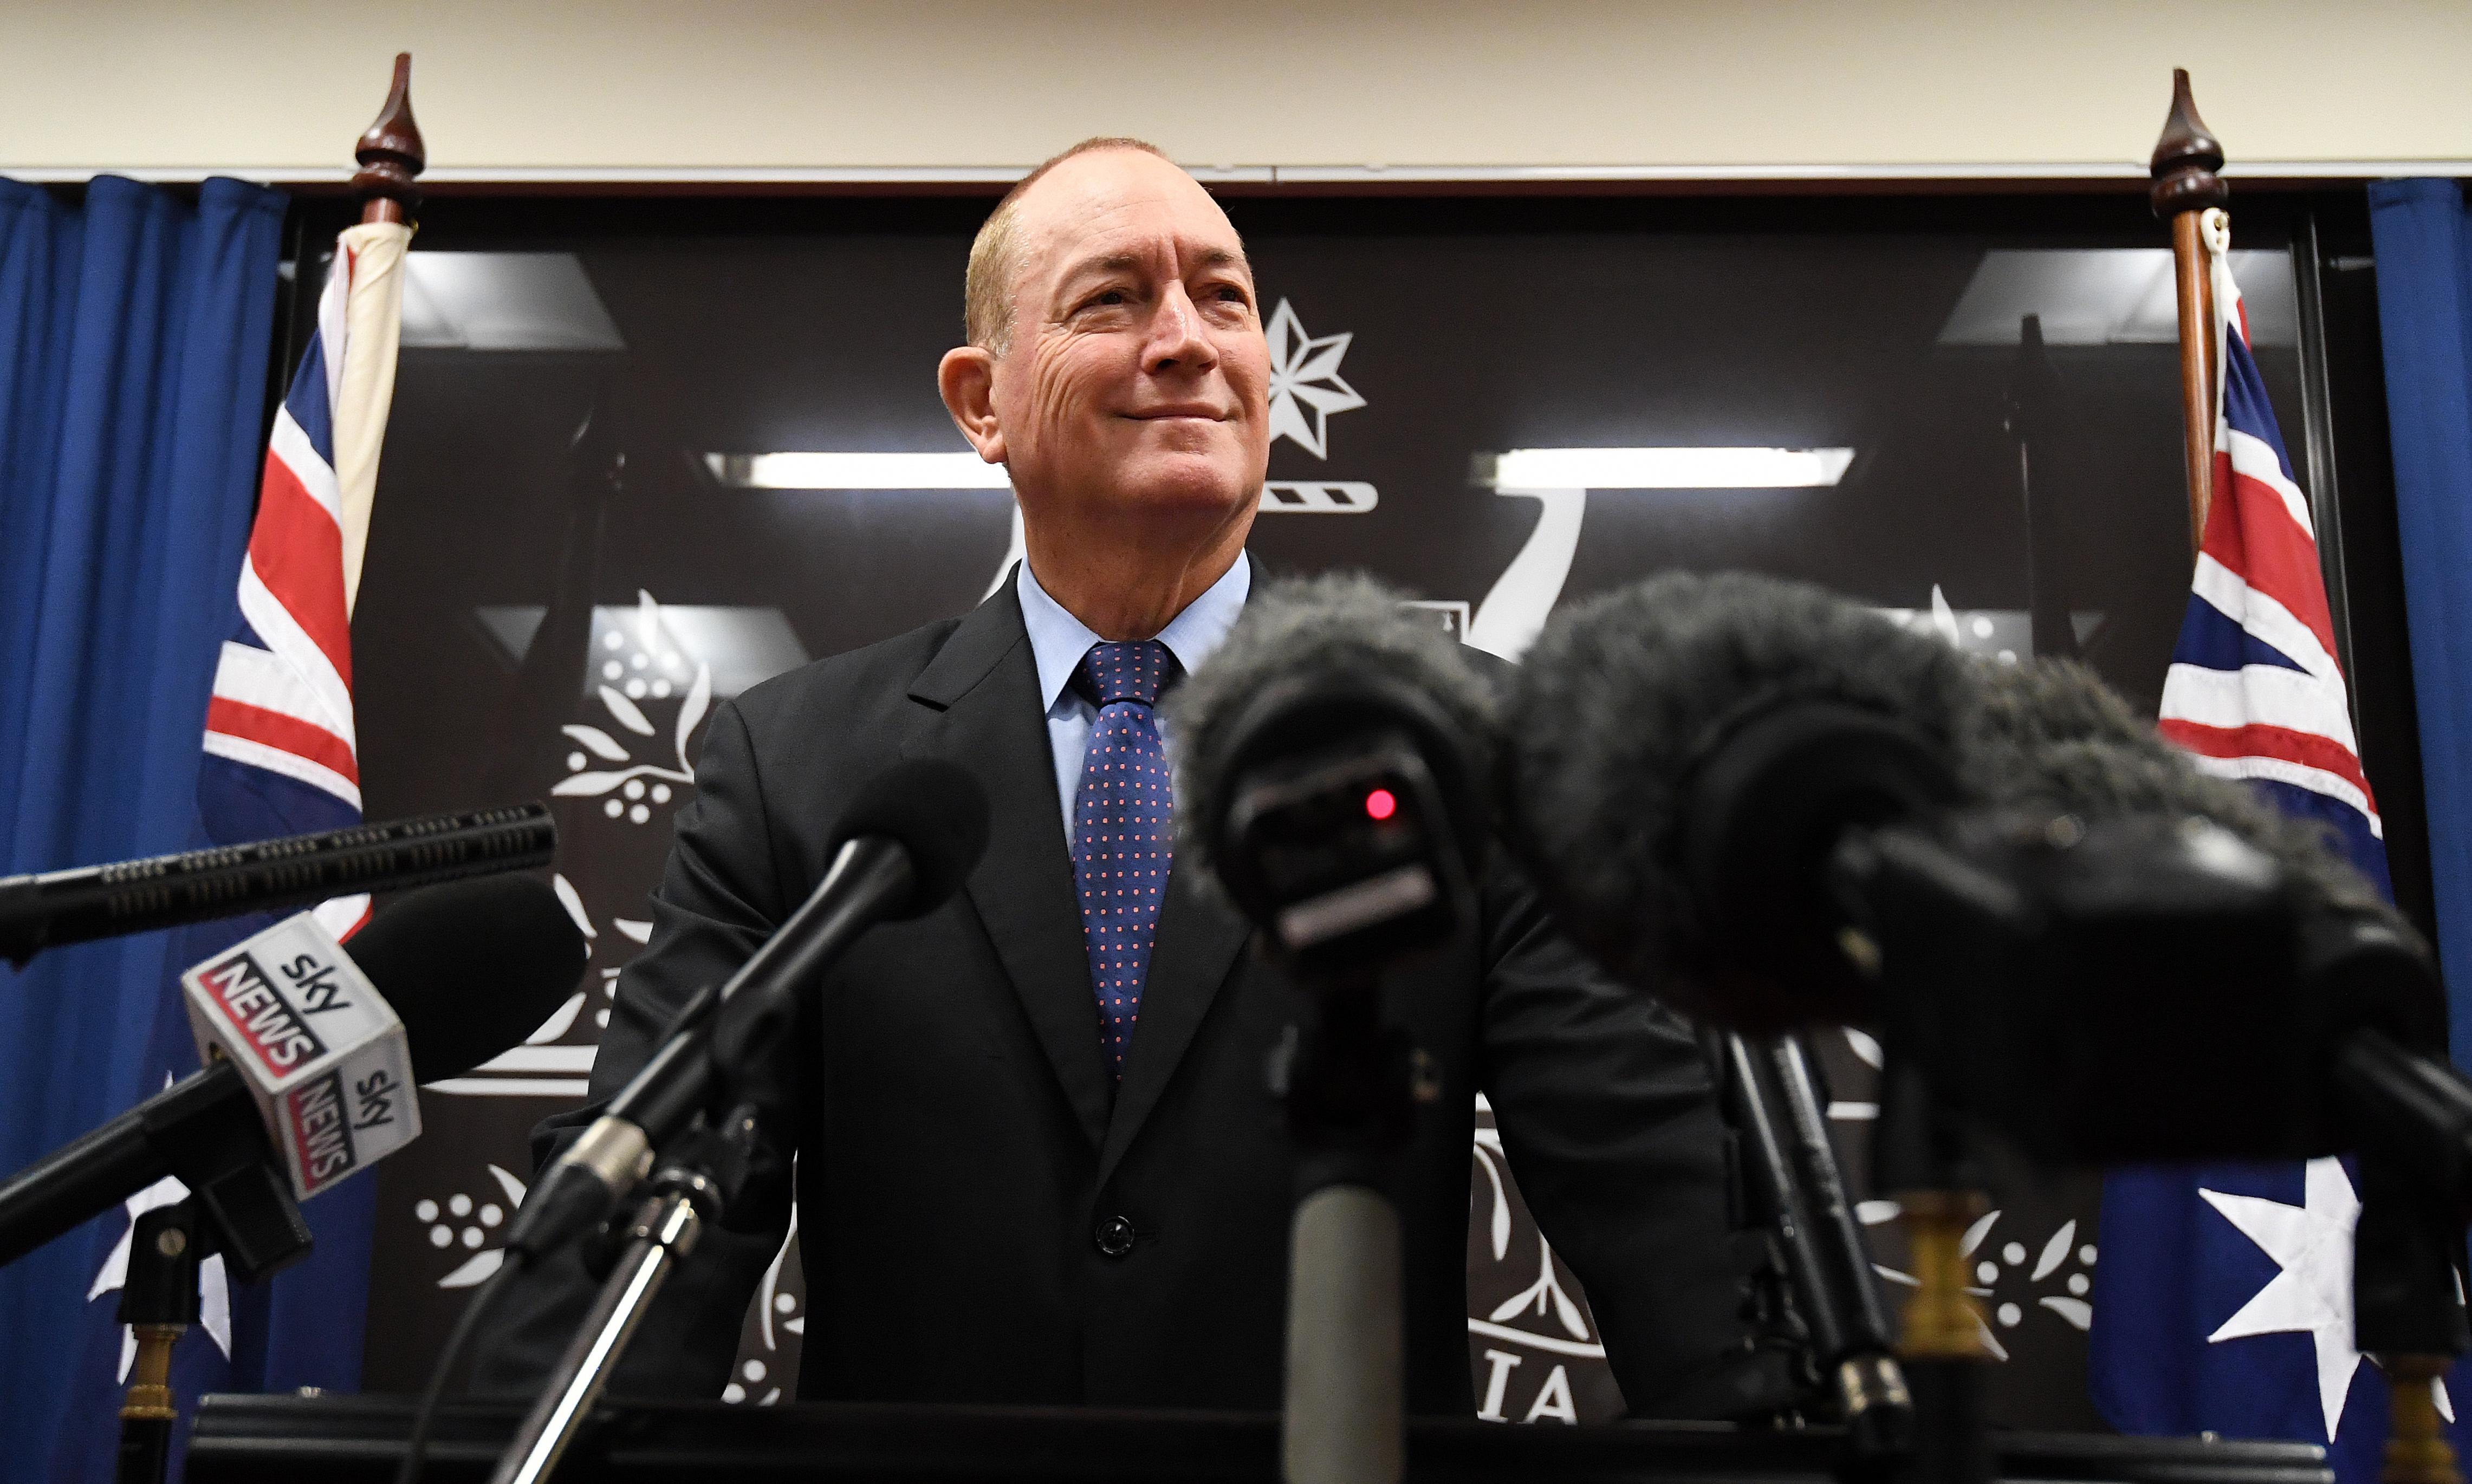 Indonesia summons Australian ambassador over Fraser Anning's Christchurch remarks